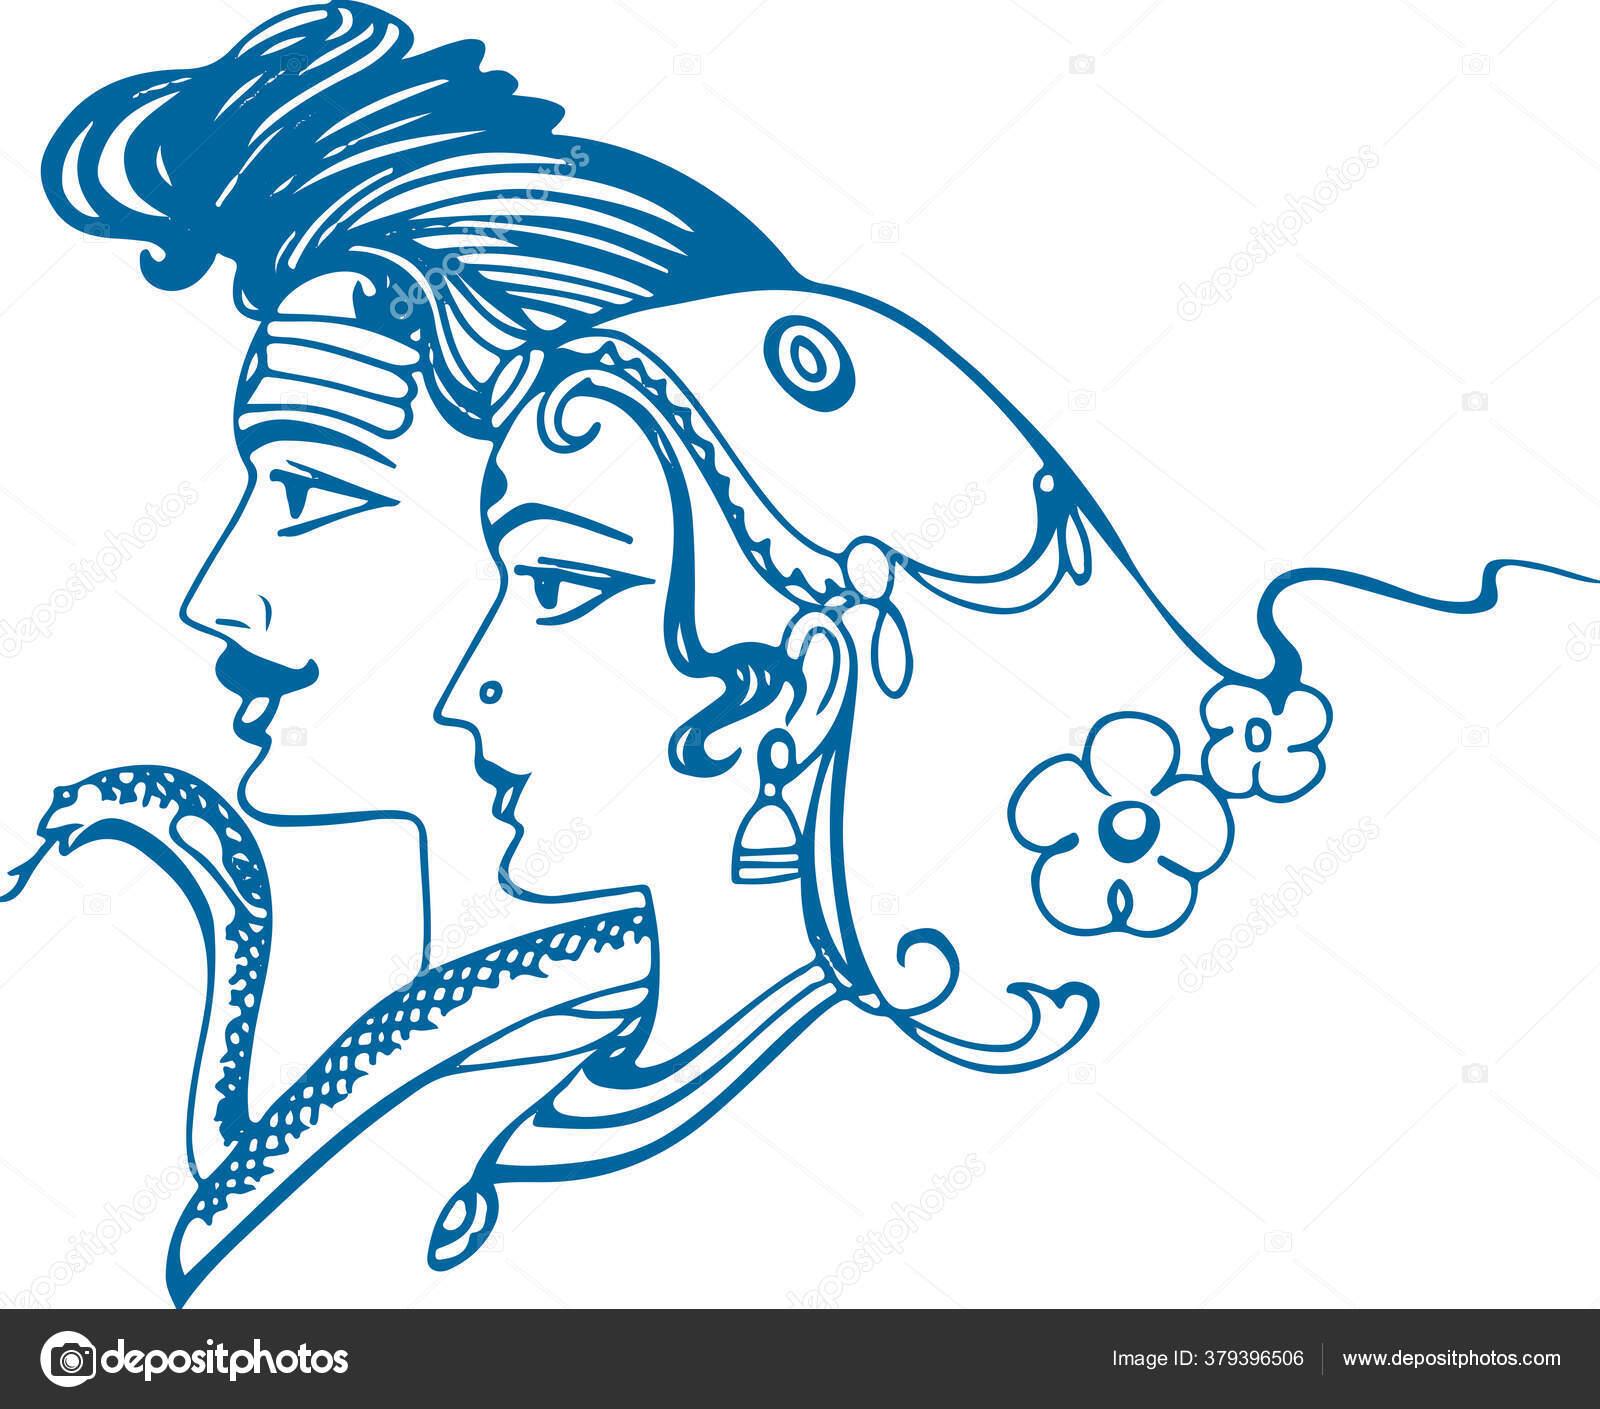 ᐈ Shiv Parvati Royalty Free Shiv Parvati Download On Depositphotos